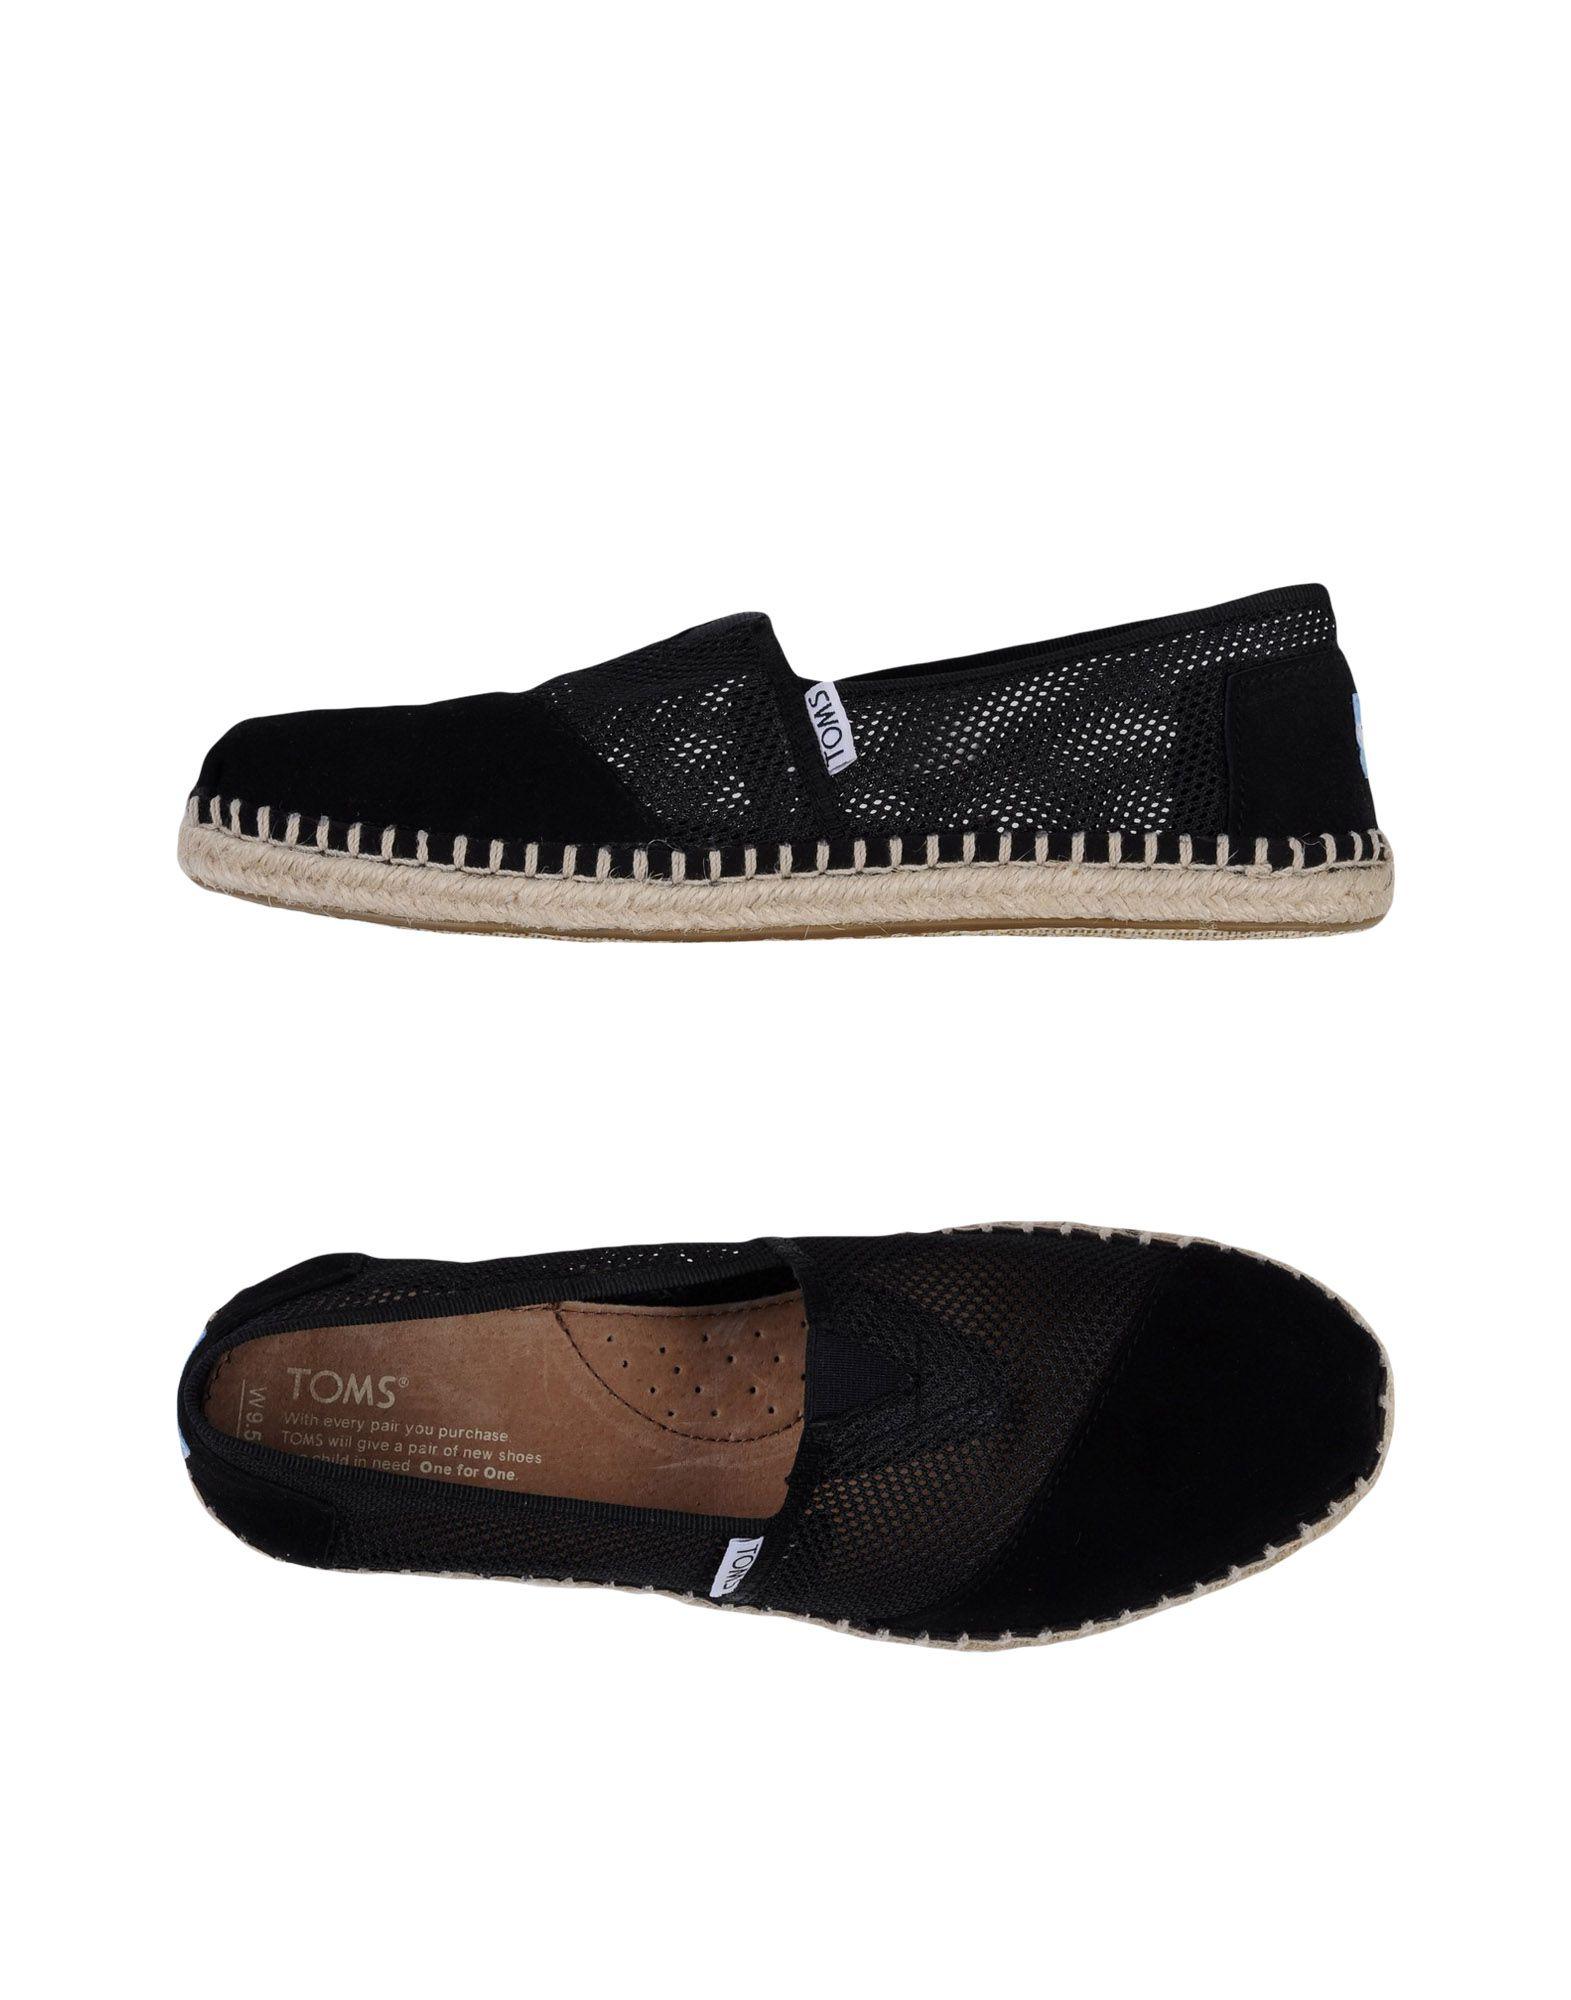 lowest price ae939 64274 TOMS Espadrilles - Footwear   YOOX.COM